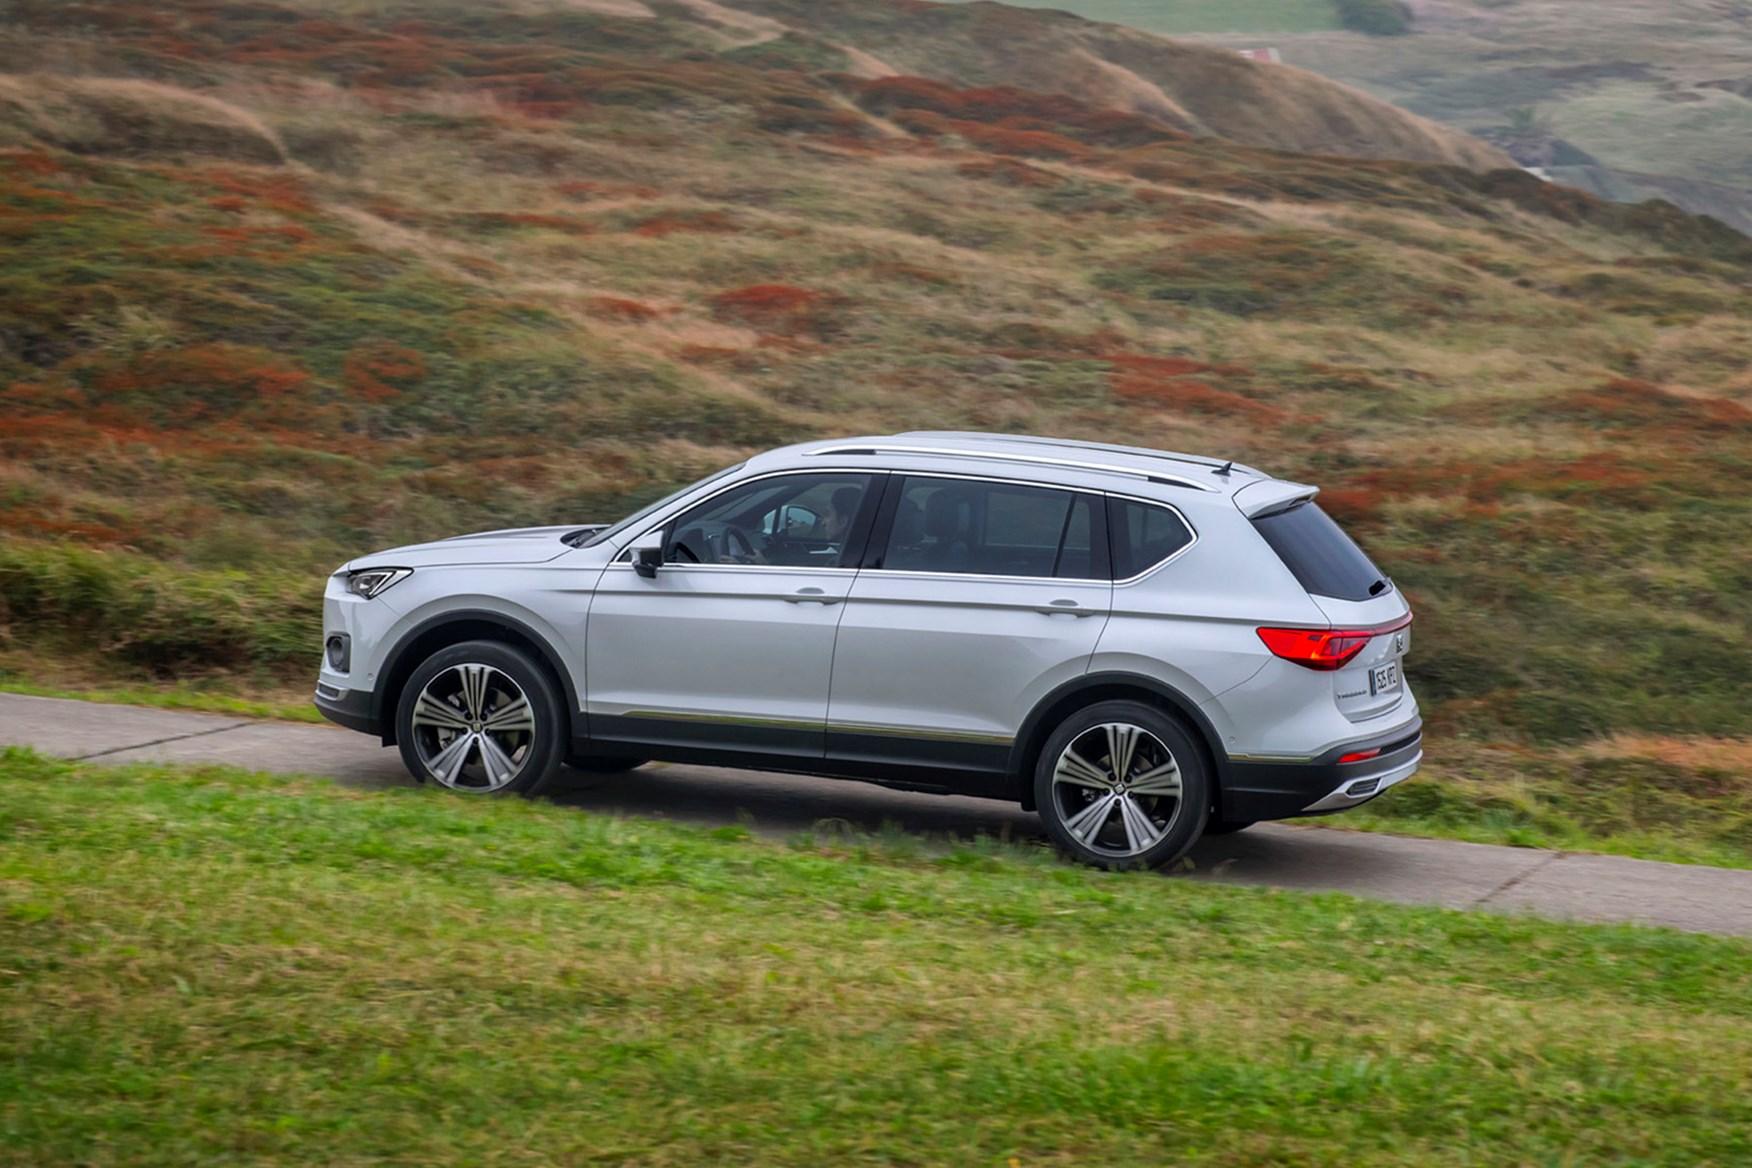 Seat Suv Ateca >> SEAT Tarraco SUV review: summary | Parkers